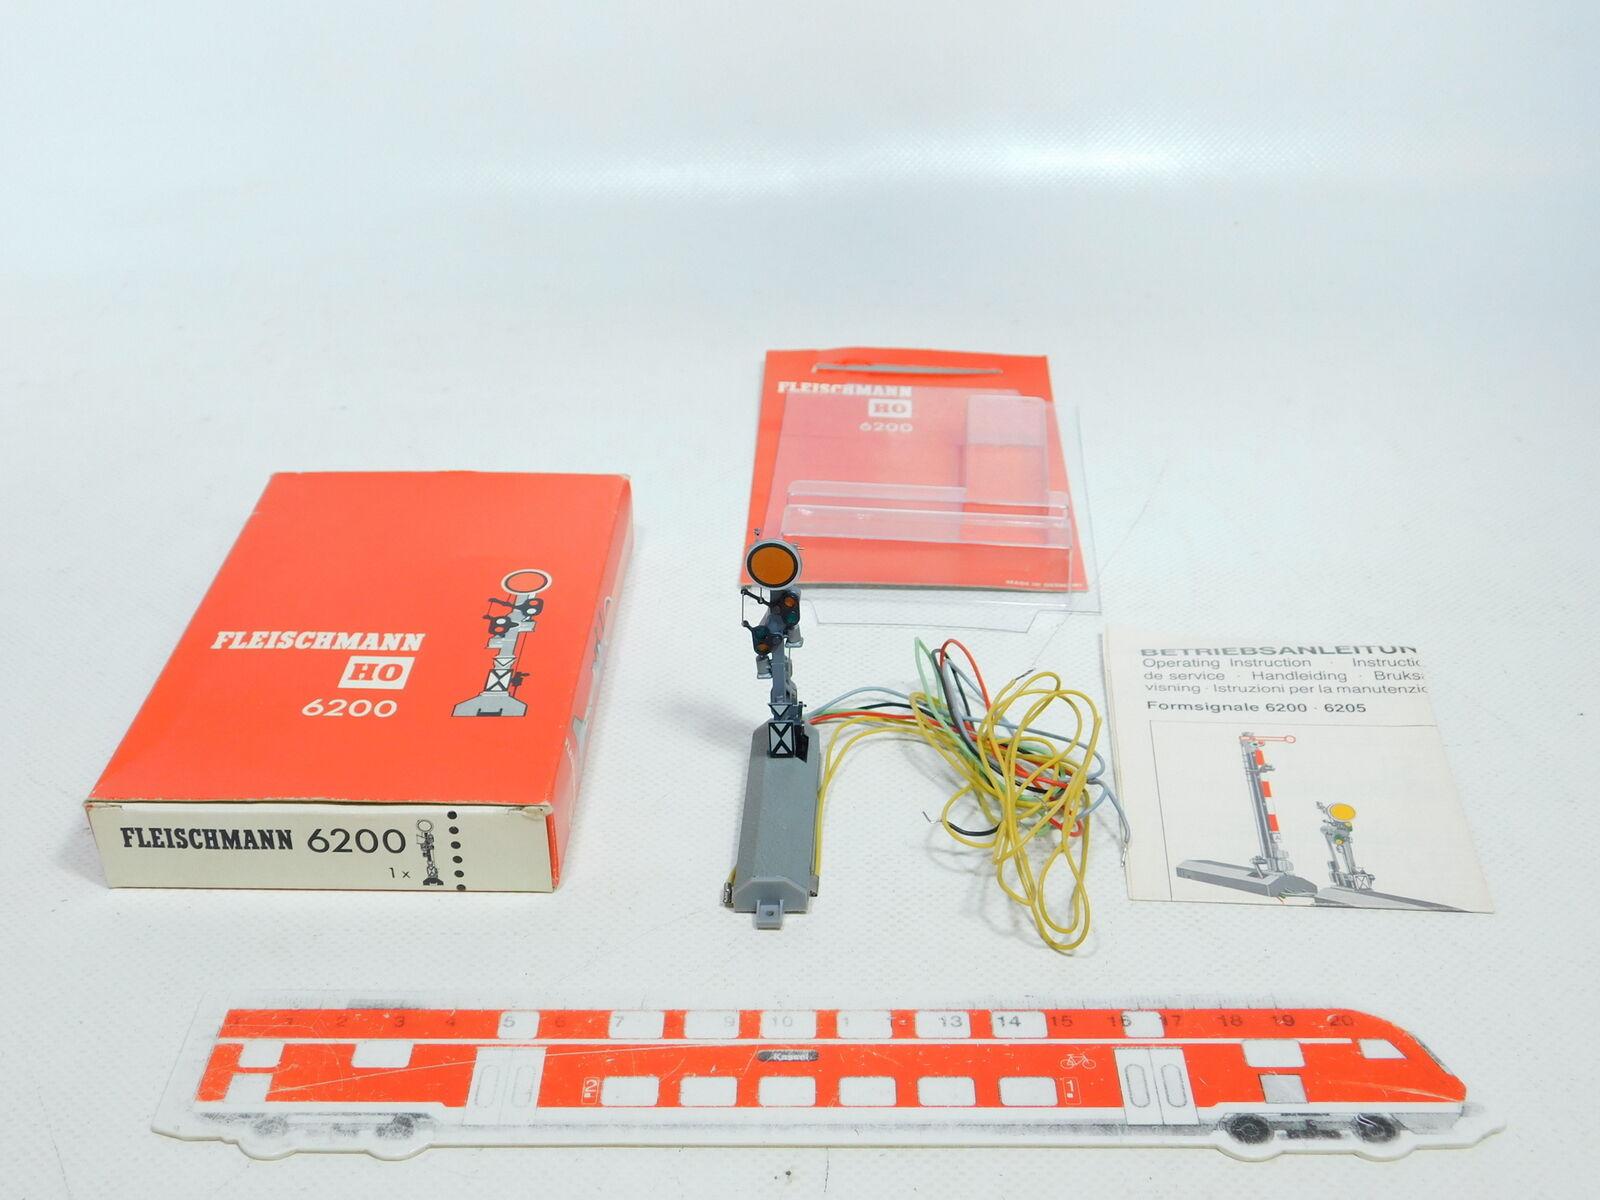 Bx685-0, 5  Fleischmann H0 Dc 6200 Form Distant Signal Signal Tested, Nip